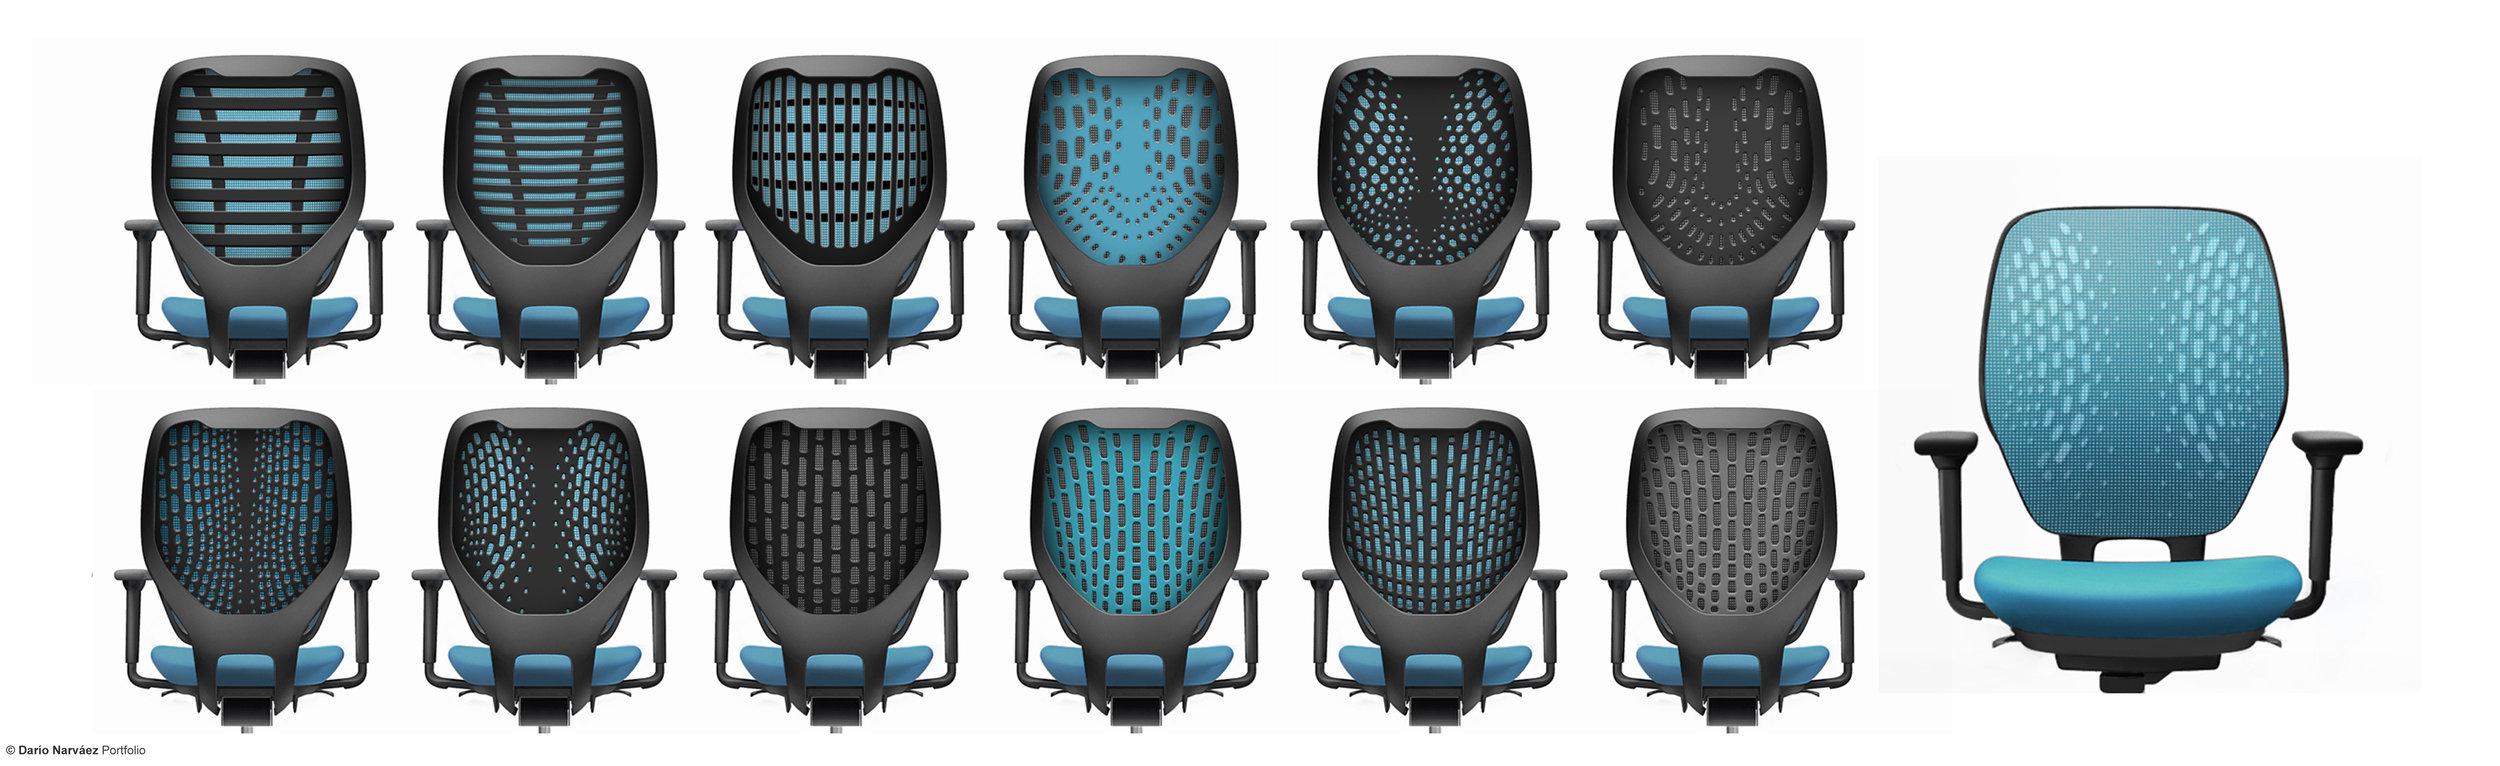 02H_DarioNarvaez_Portfolio_Ingo_Chair_Concept_Development_WEB-1.jpg